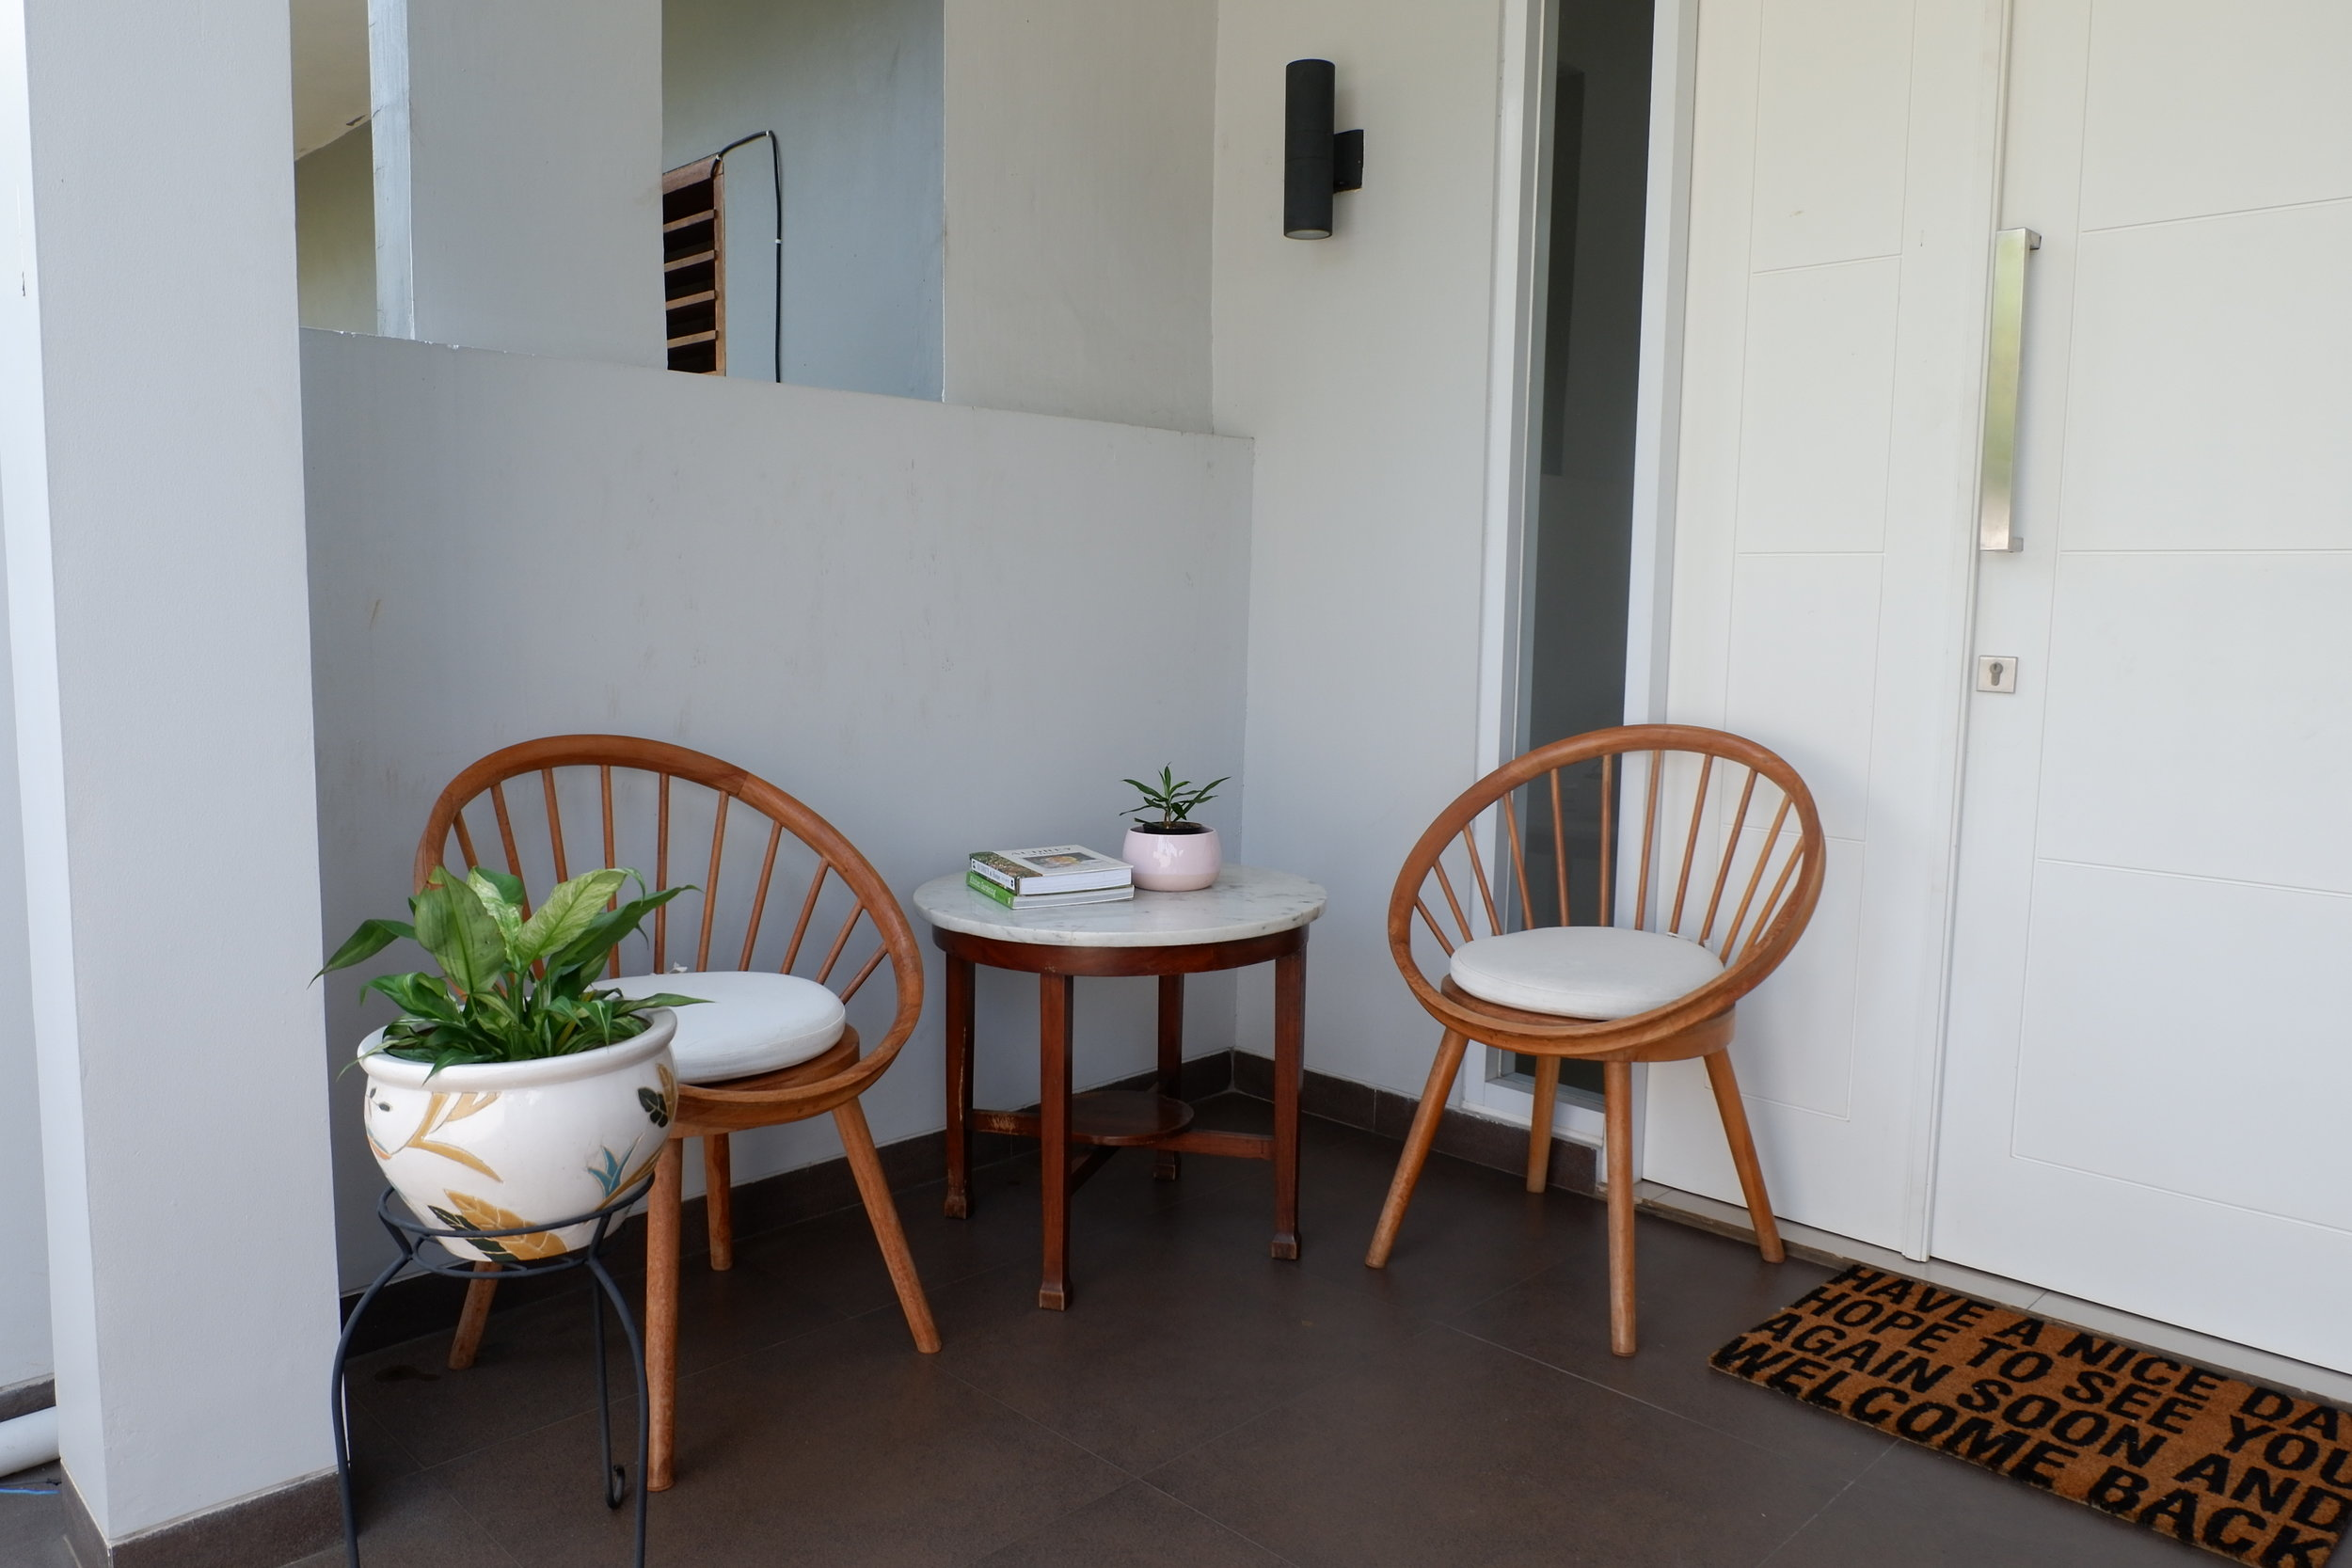 Sepasang kursi kayu dan tanaman hijau yang meromantiskan teras di sore hari